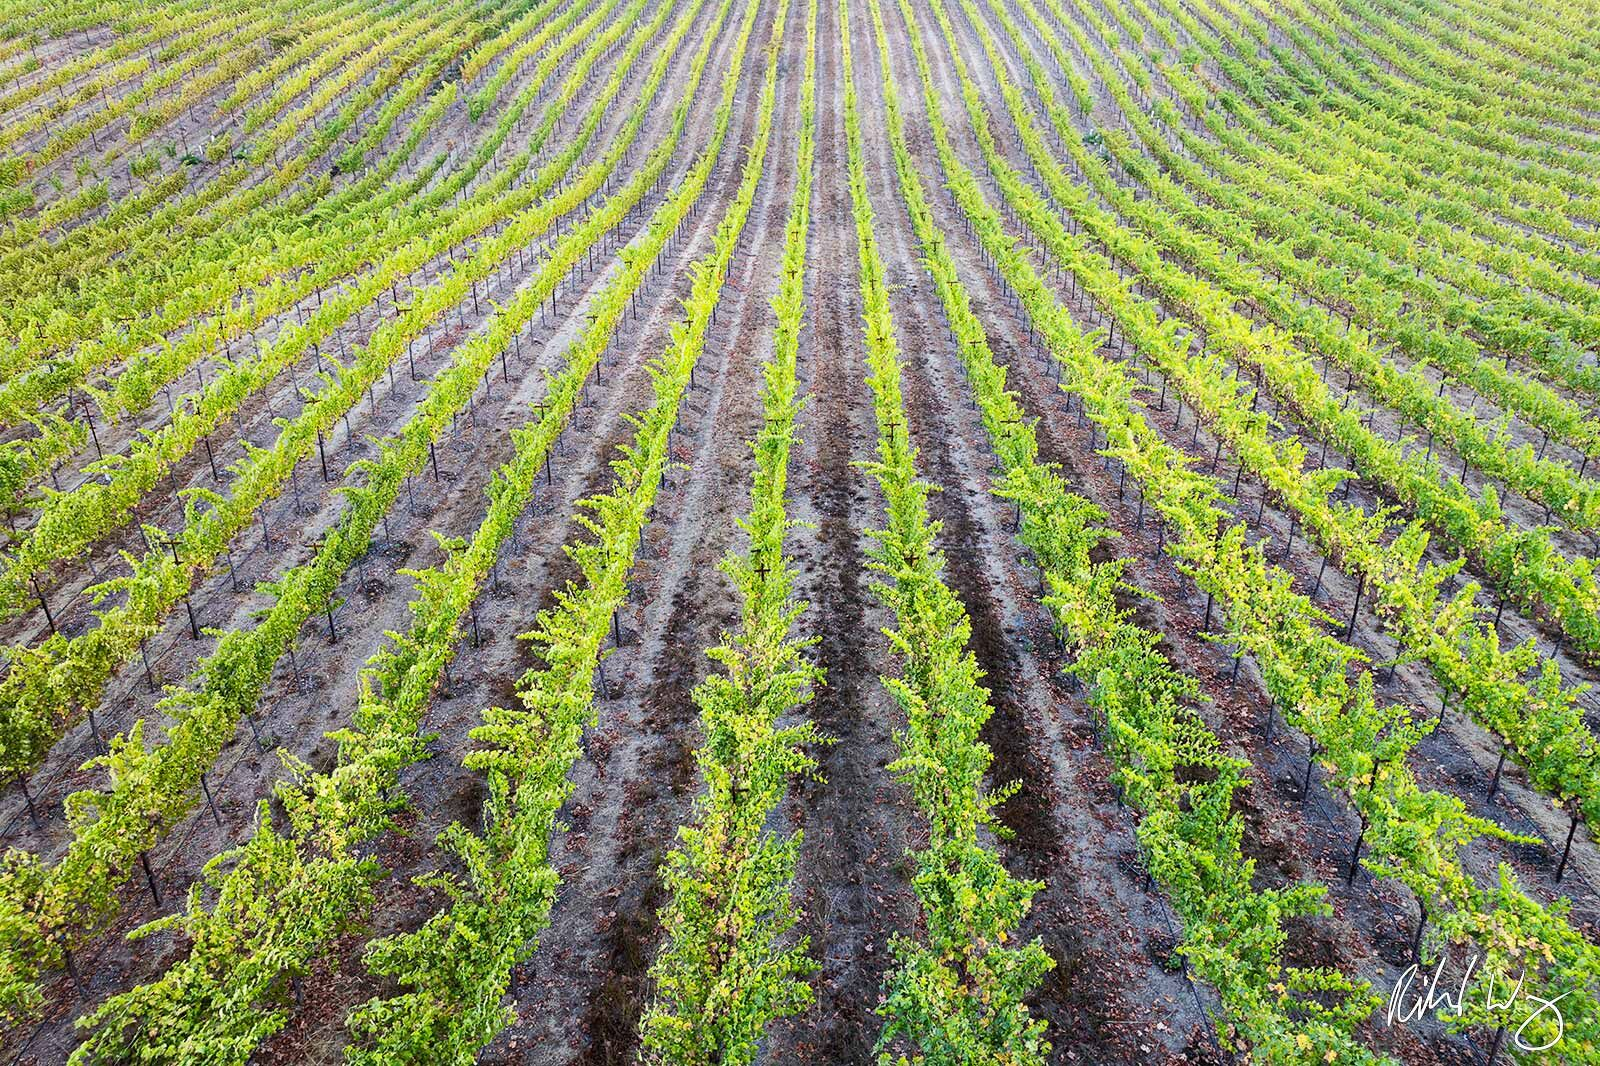 Rows of Vineyard, Alexander Valley AVA, California, photo